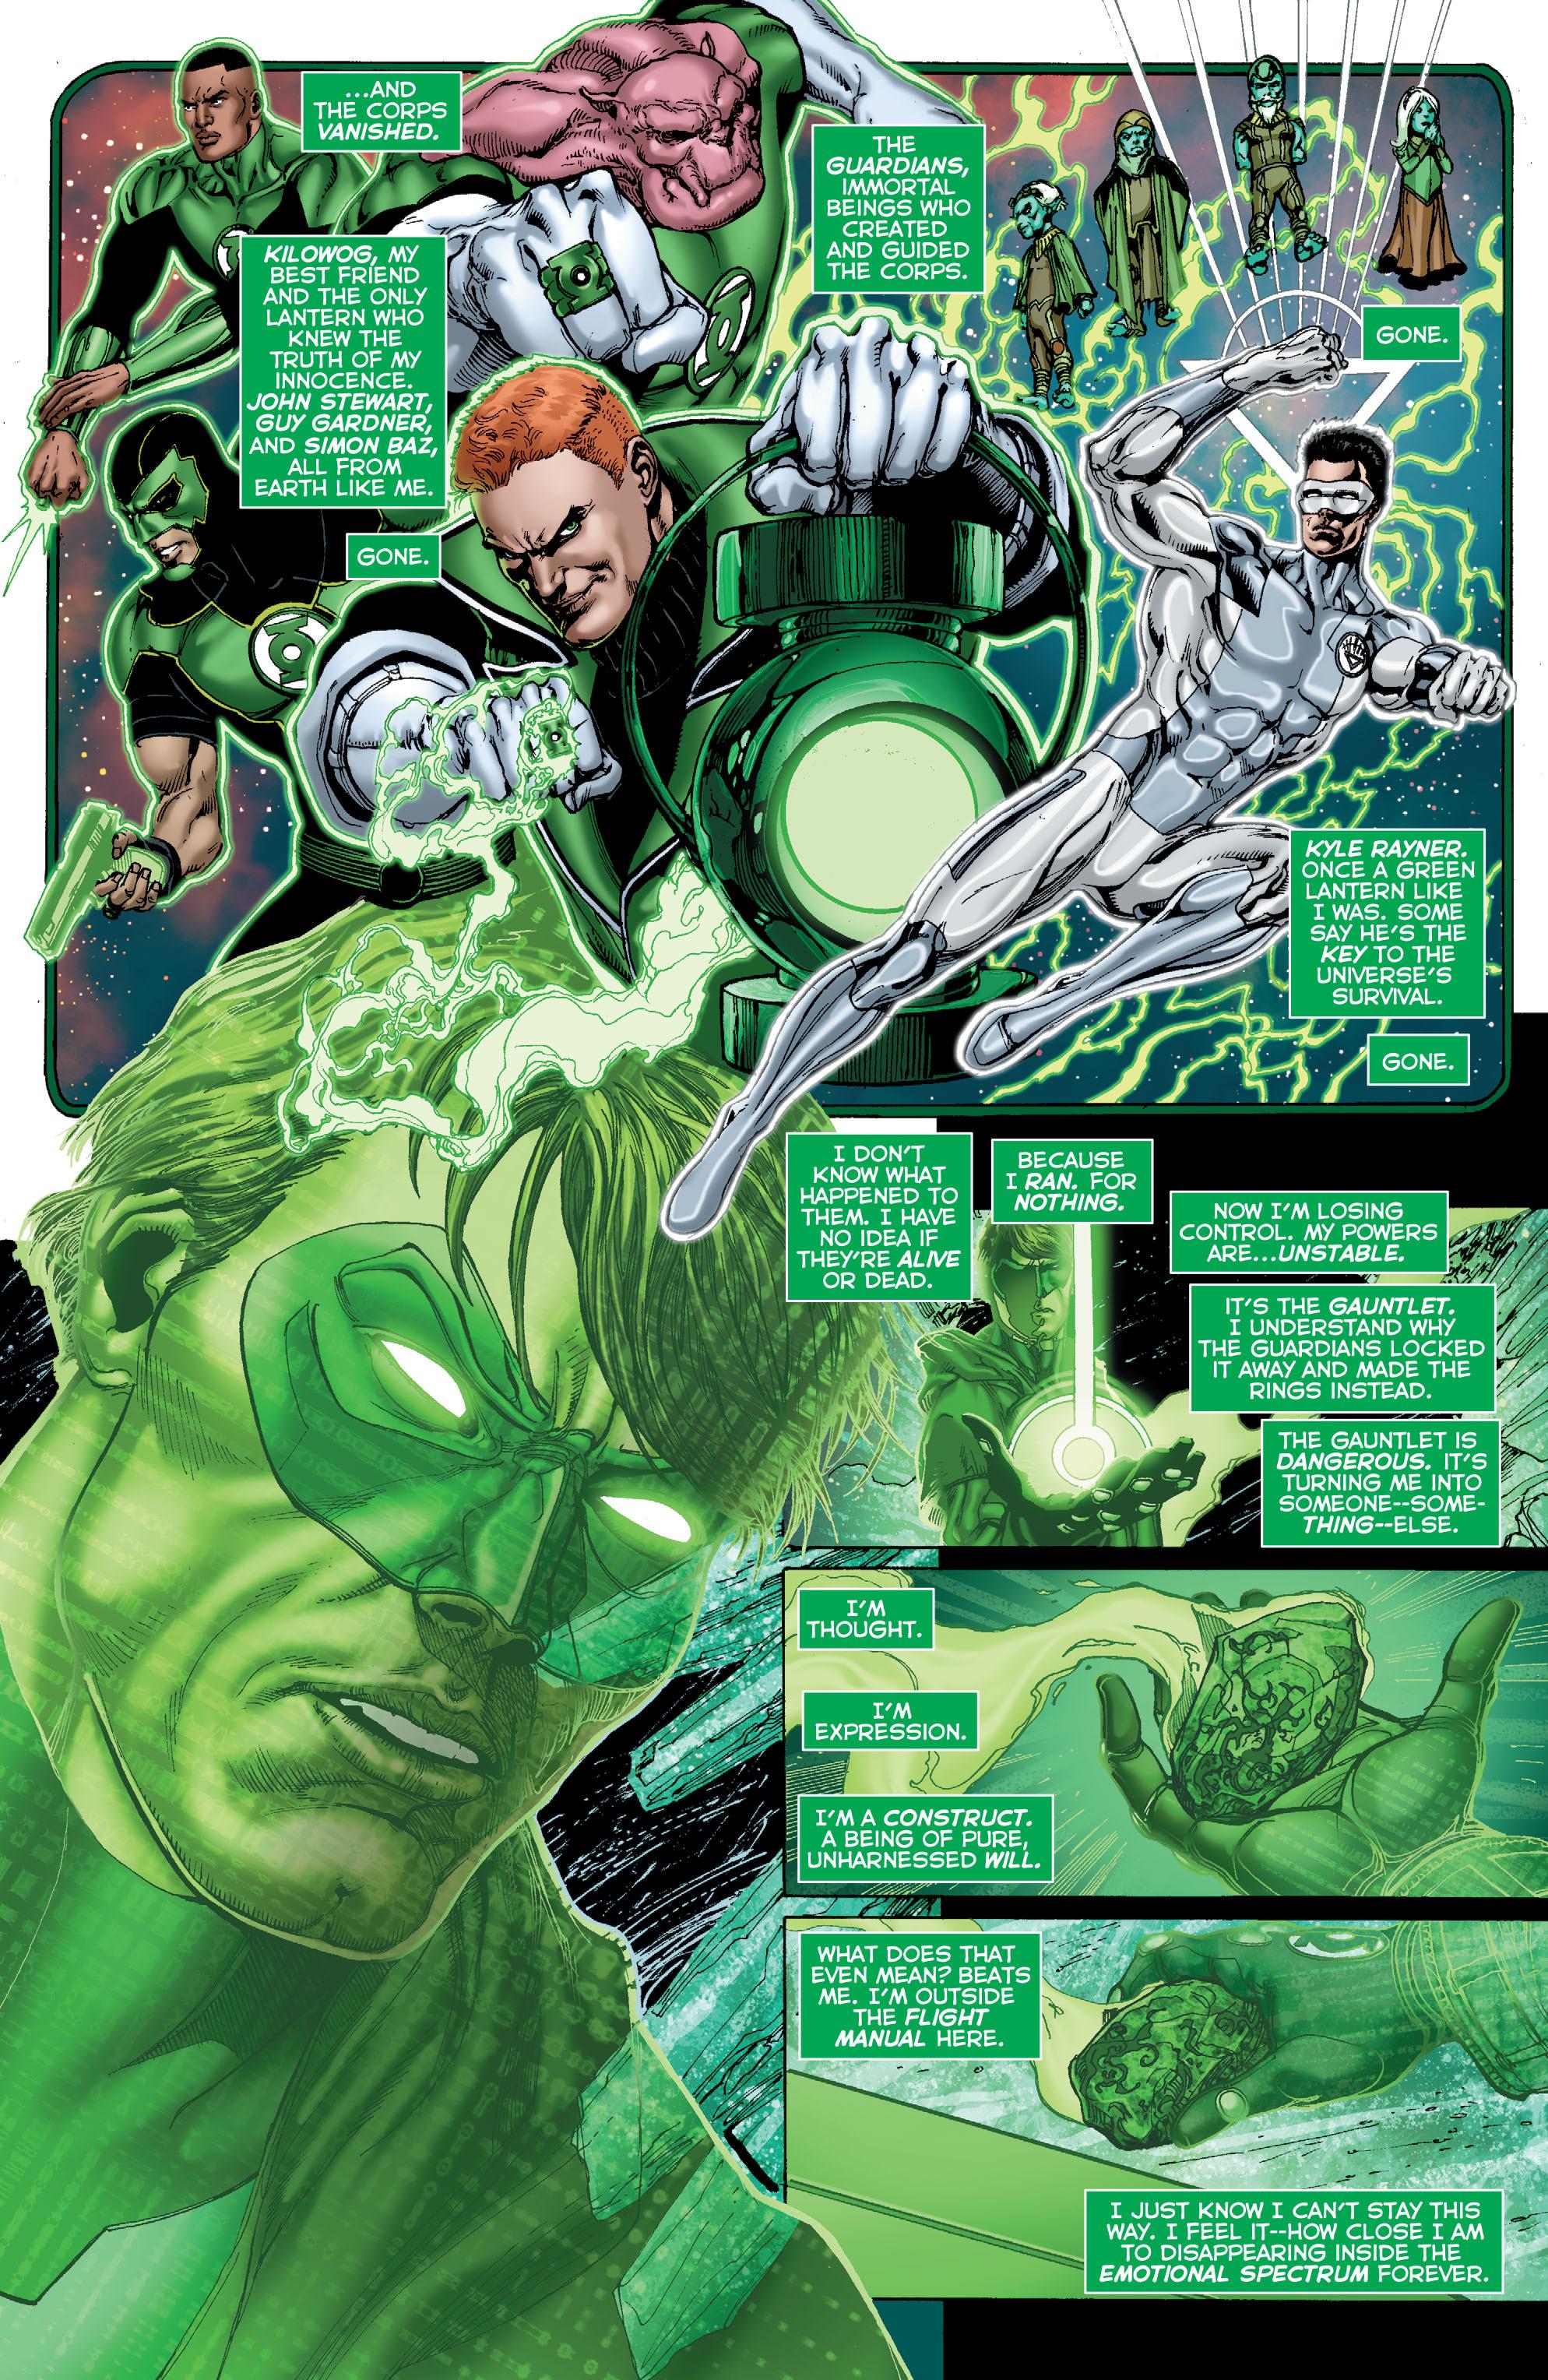 983-987 - Les comics que vous lisez en ce moment - Page 2 Hal-Jordan-and-the-Green-Lantern-Corps-Rebirth-1-spoilers-2